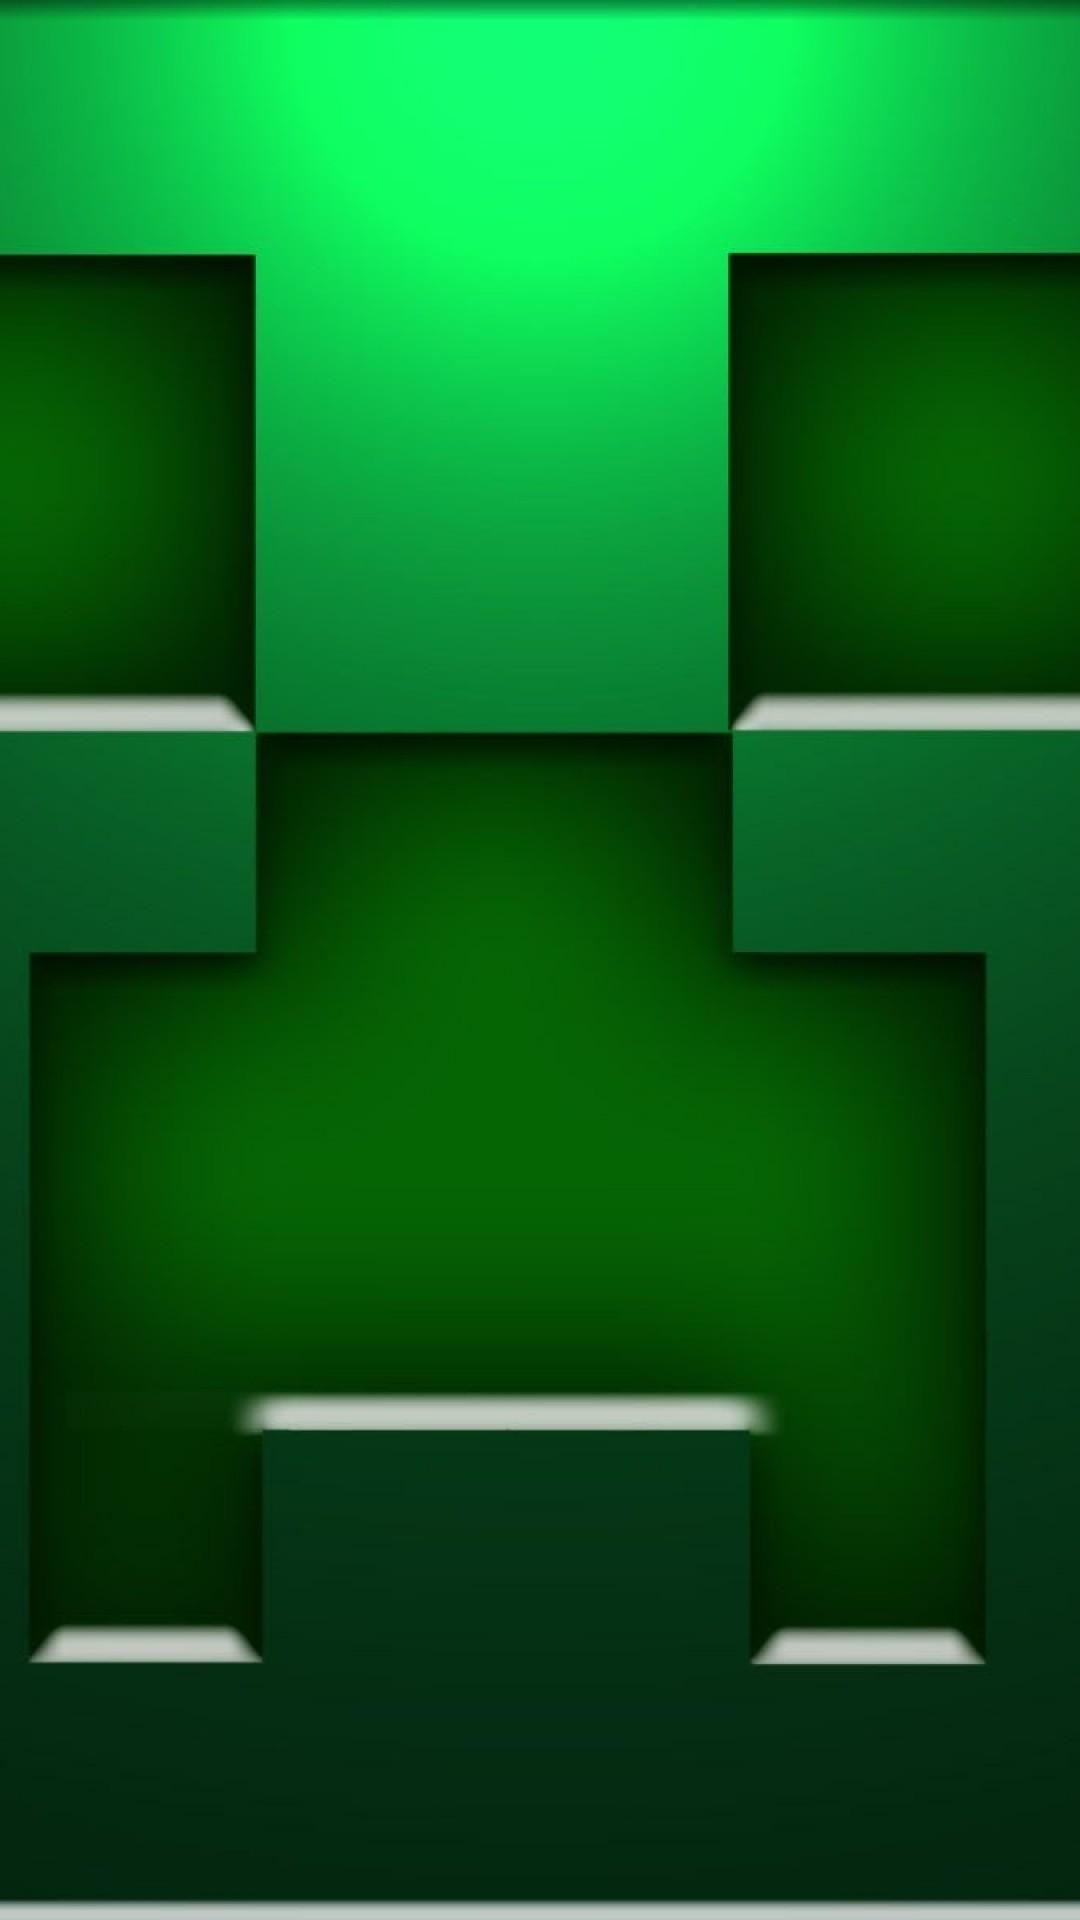 Download Minecraft Creeper Wallpaper Mobile Phone Wallpaper Hd